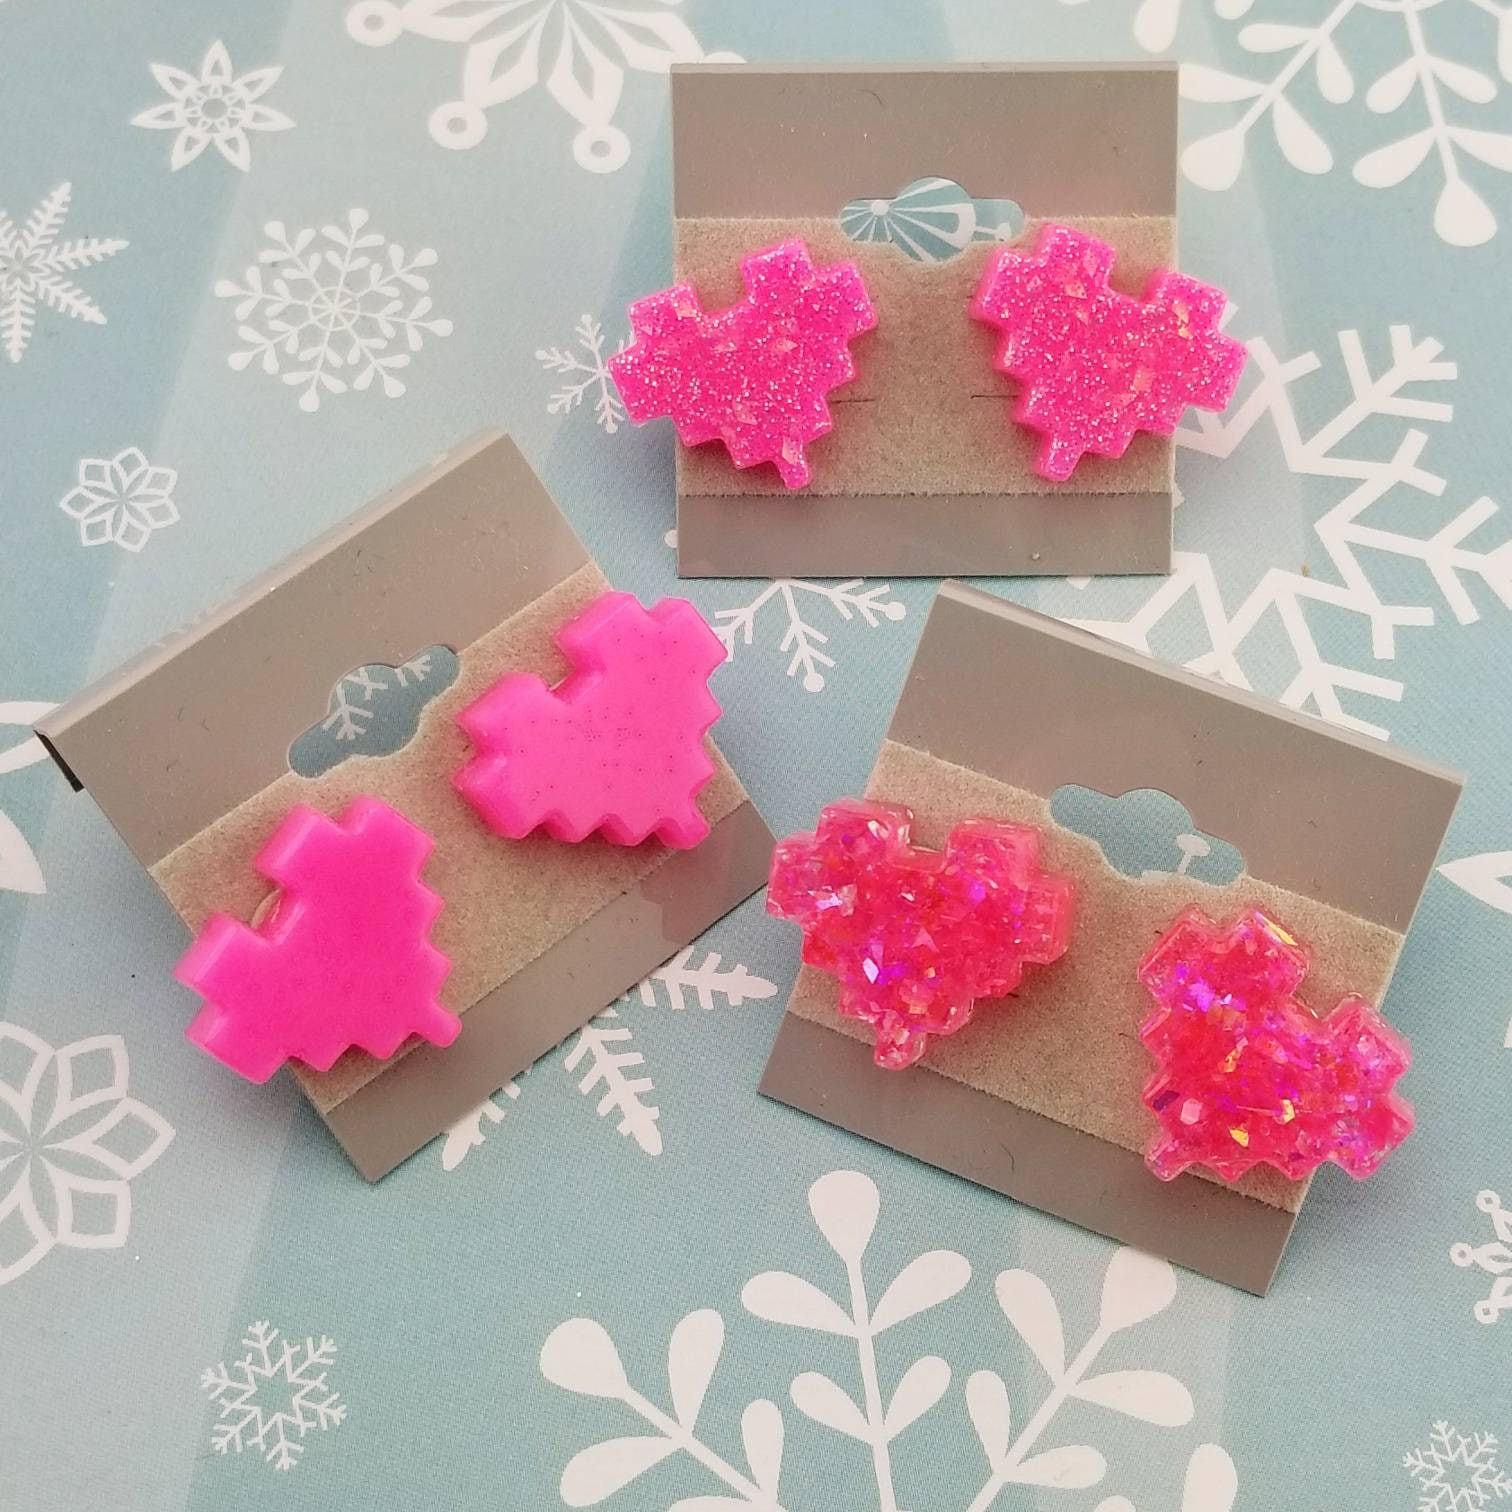 Kawaii Hot Pink Pixel Heart Gamer Girl Earrings